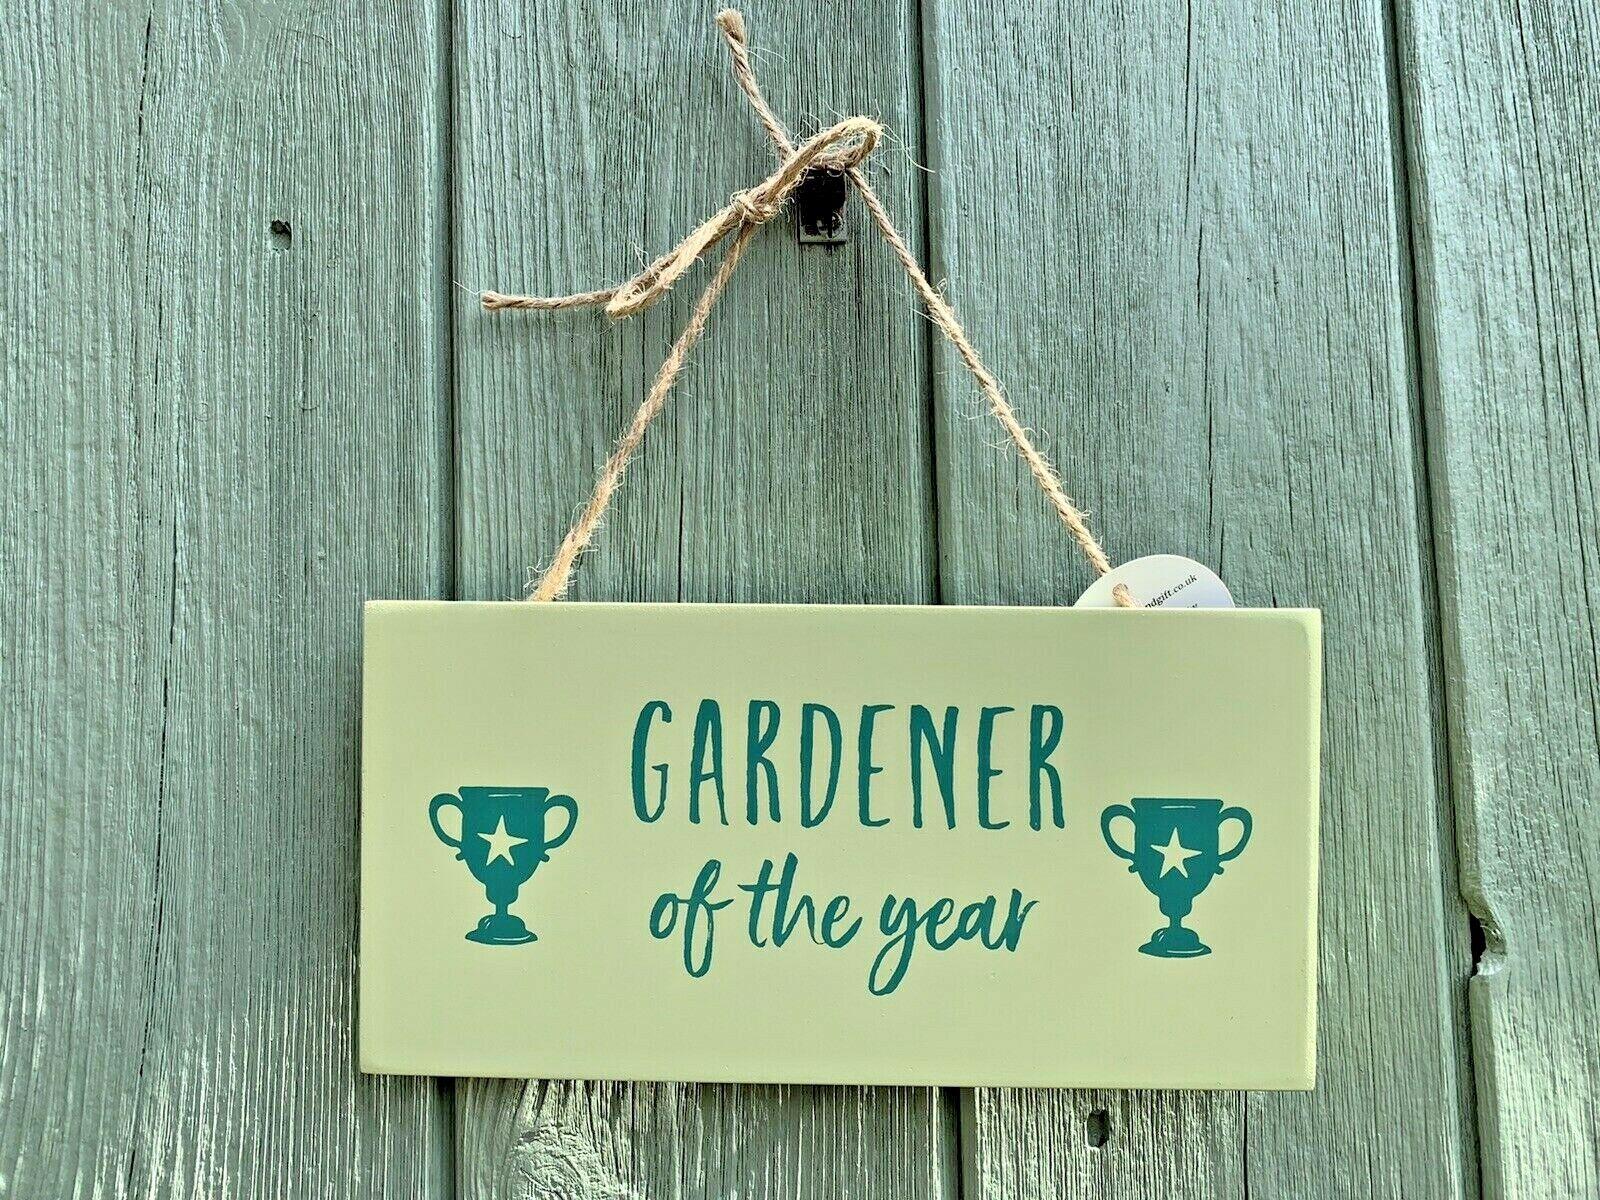 Gardener of the Year' Garden Sign, Light Green MDF Wooden Outdoor Decor Gift